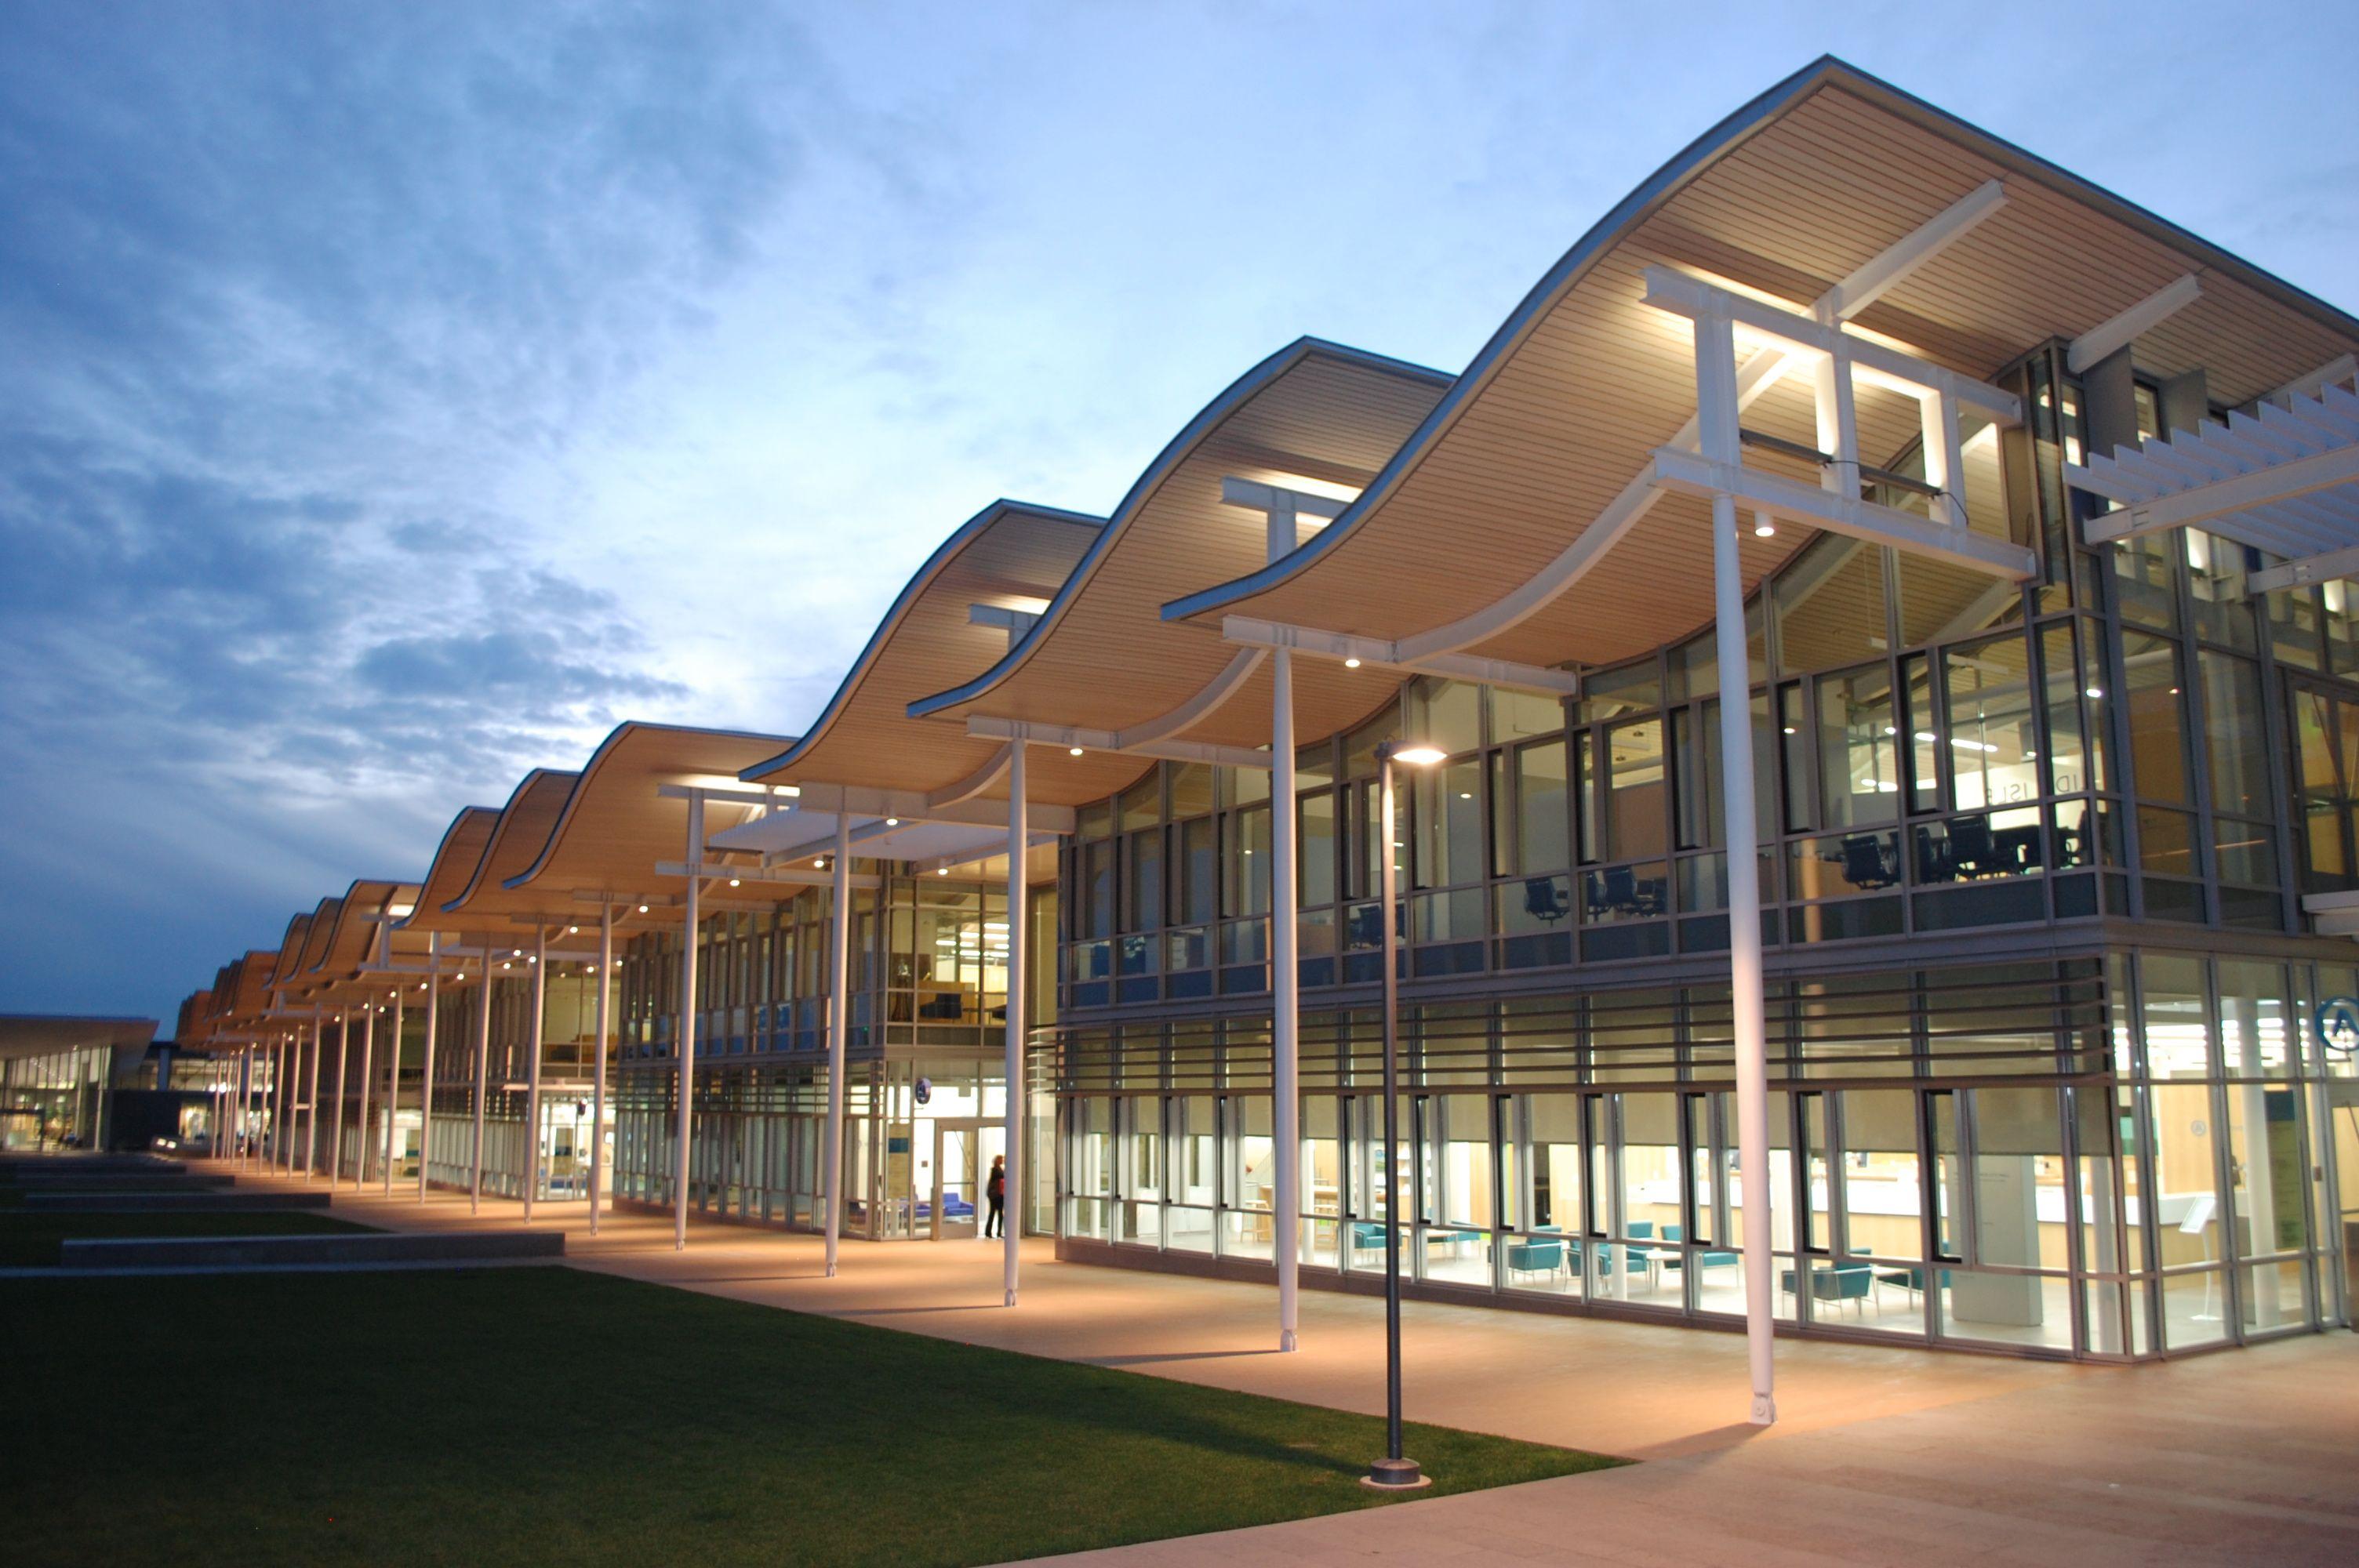 Image of external facade of the Manukau bus station arrrX Pinterest